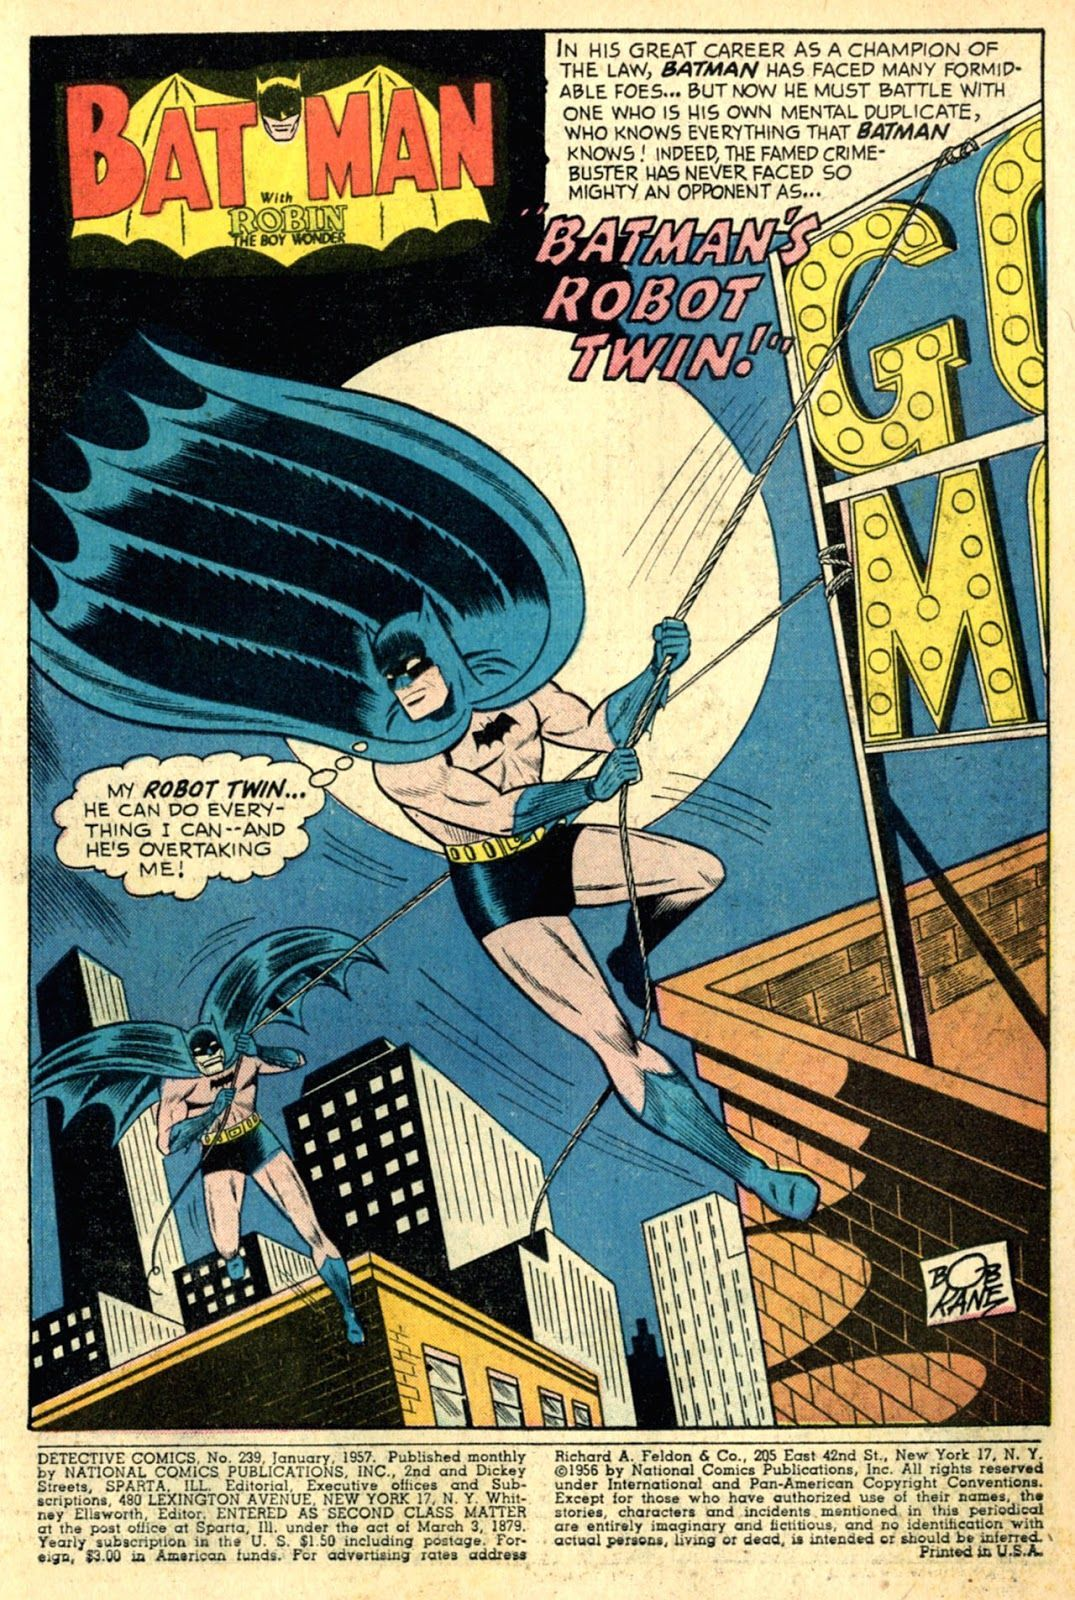 Detective Comics #239 (Writers: Jack Schiff Artists: Sheldon Moldoff, Charles Paris, Jack Adler, Ira Schnapp)